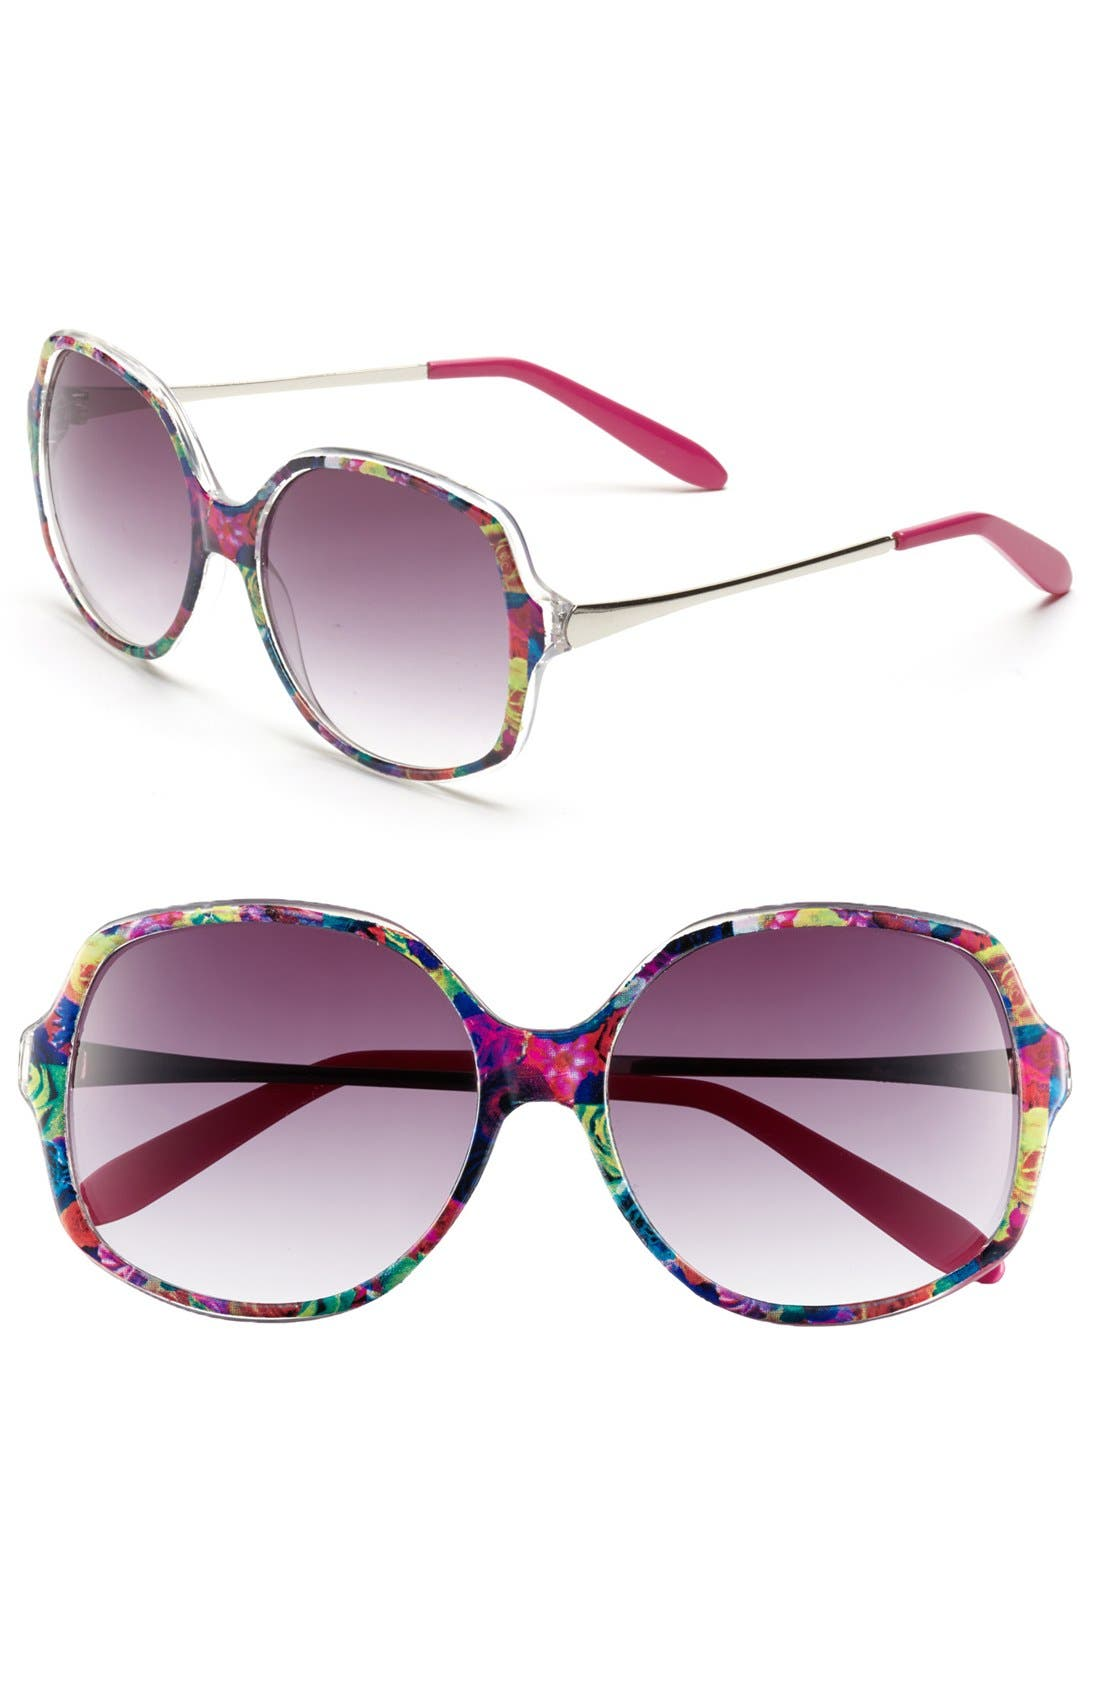 Alternate Image 1 Selected - Outlook Eyewear 'Point' 57mm Sunglasses